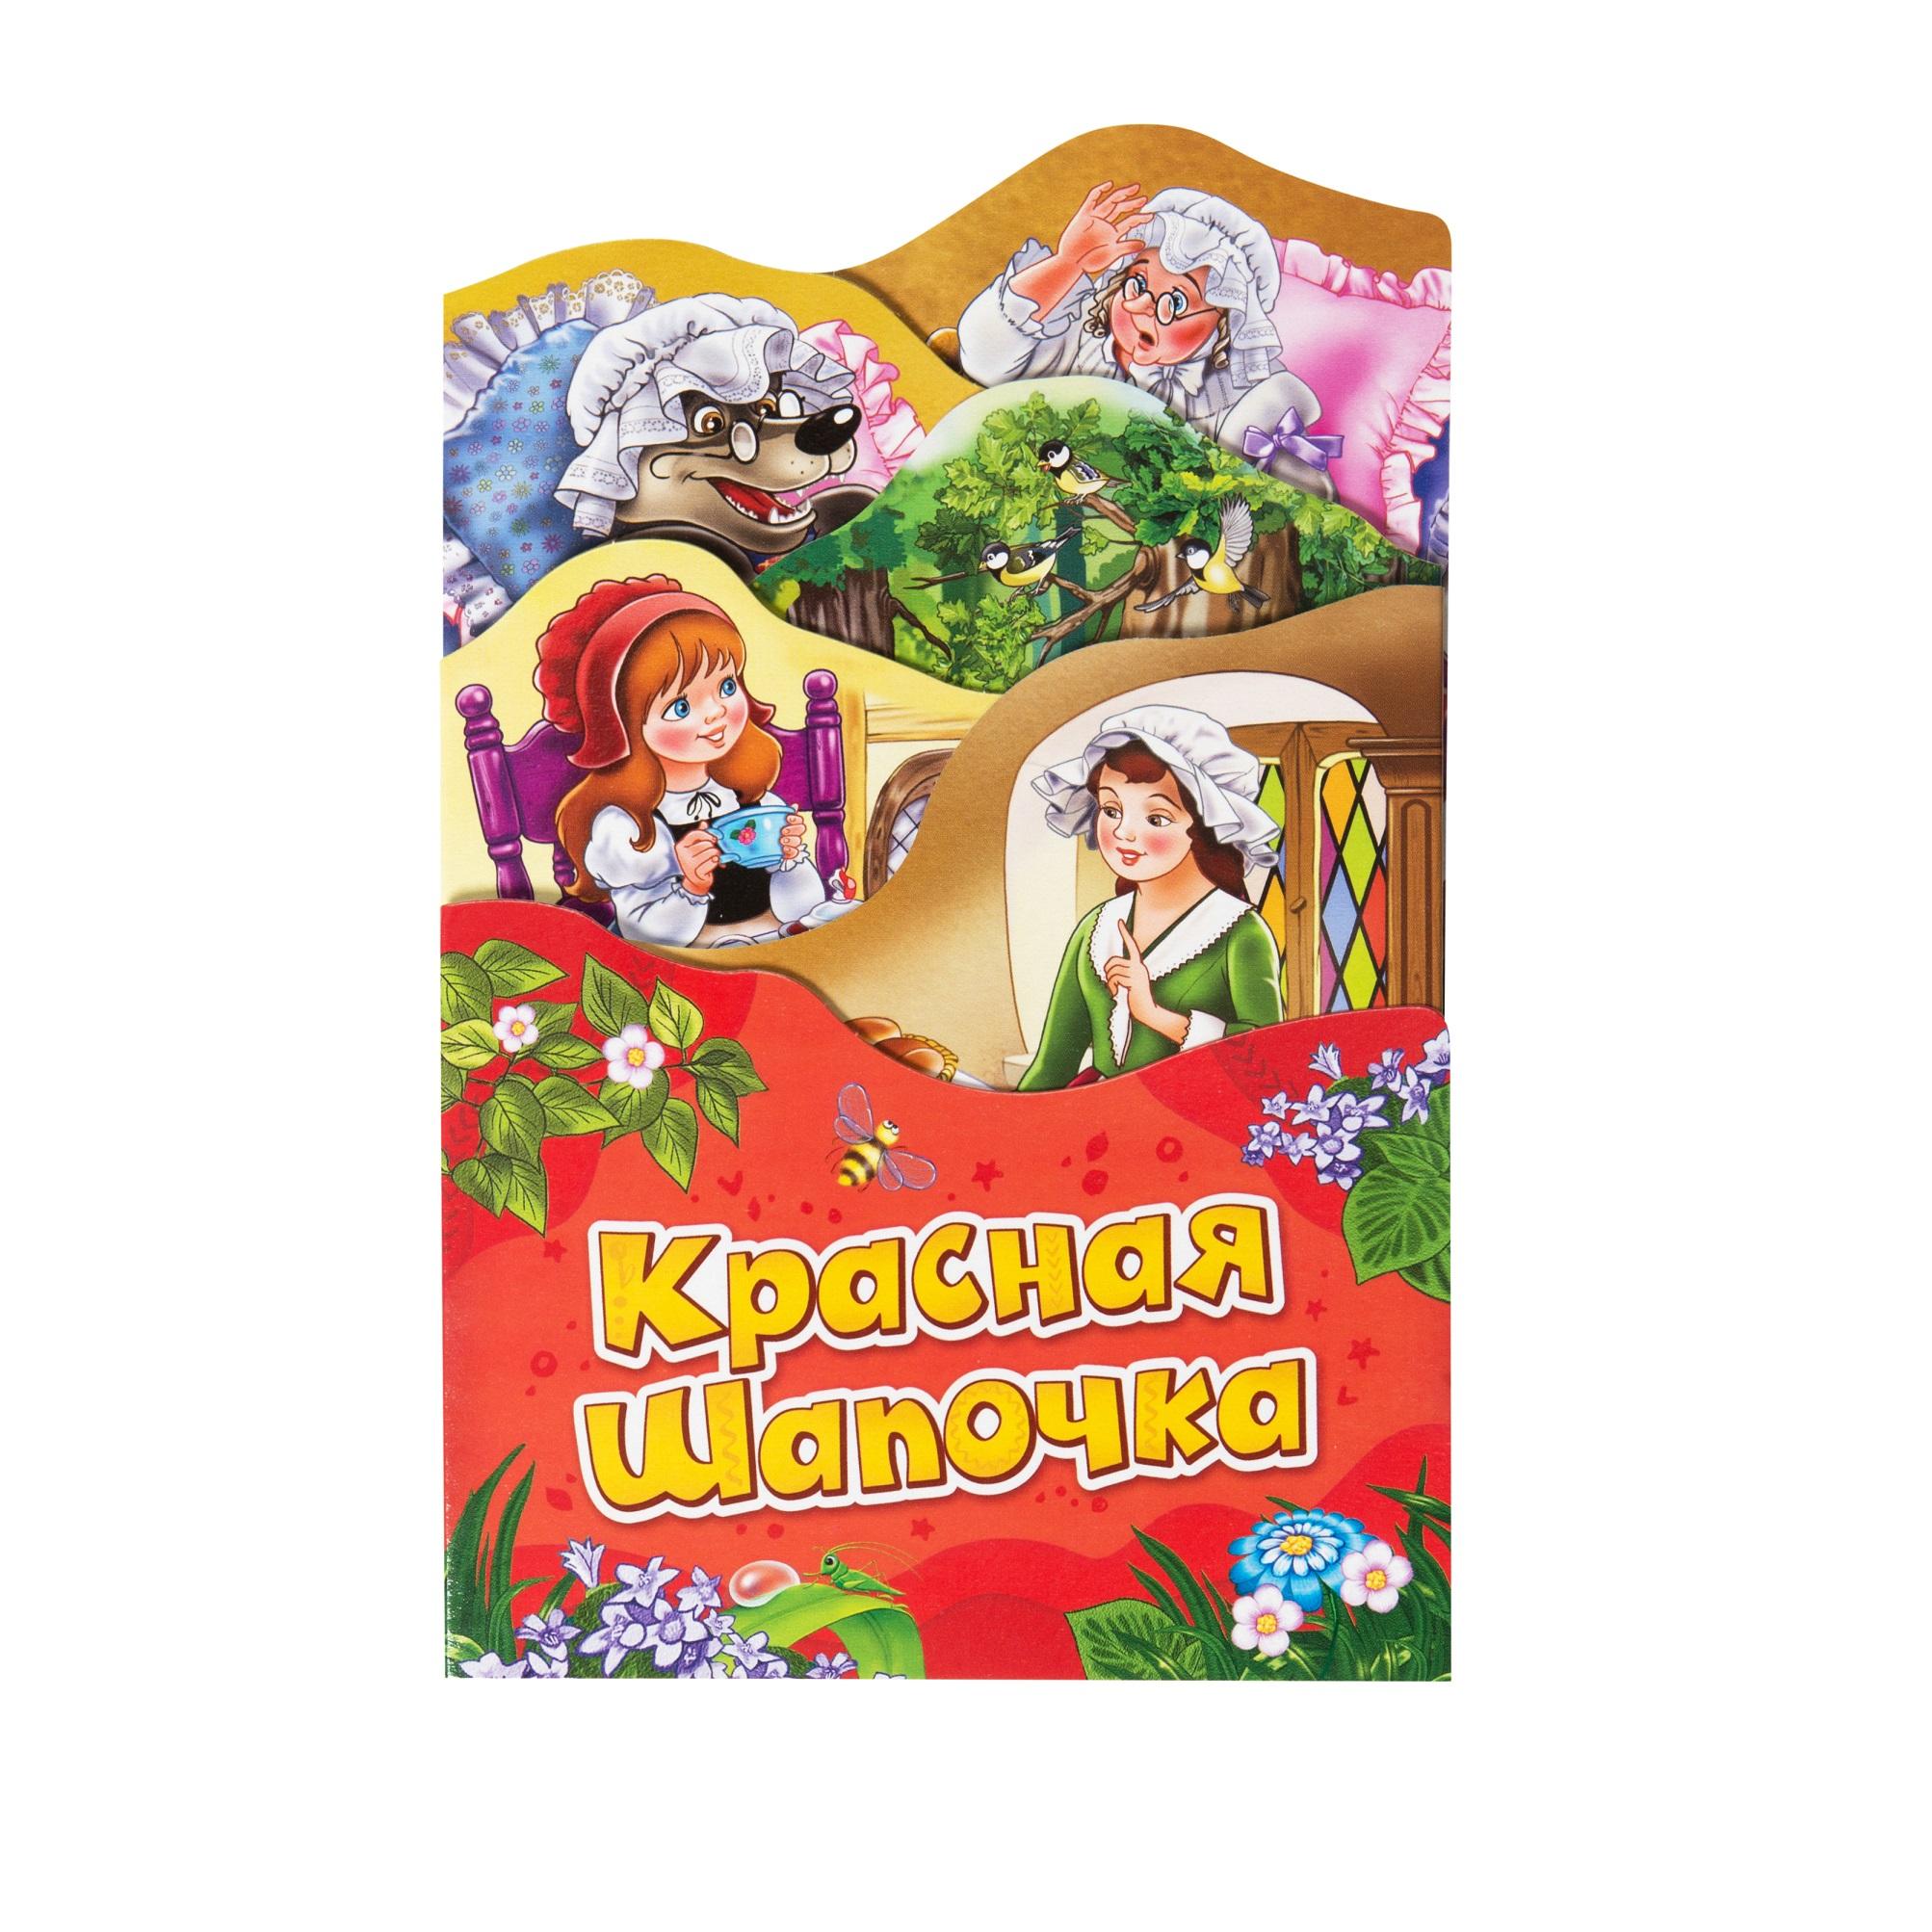 Перро Ш. Красная шапочка (Раскладные книжки) александр григорьев волшебныйлес сказка